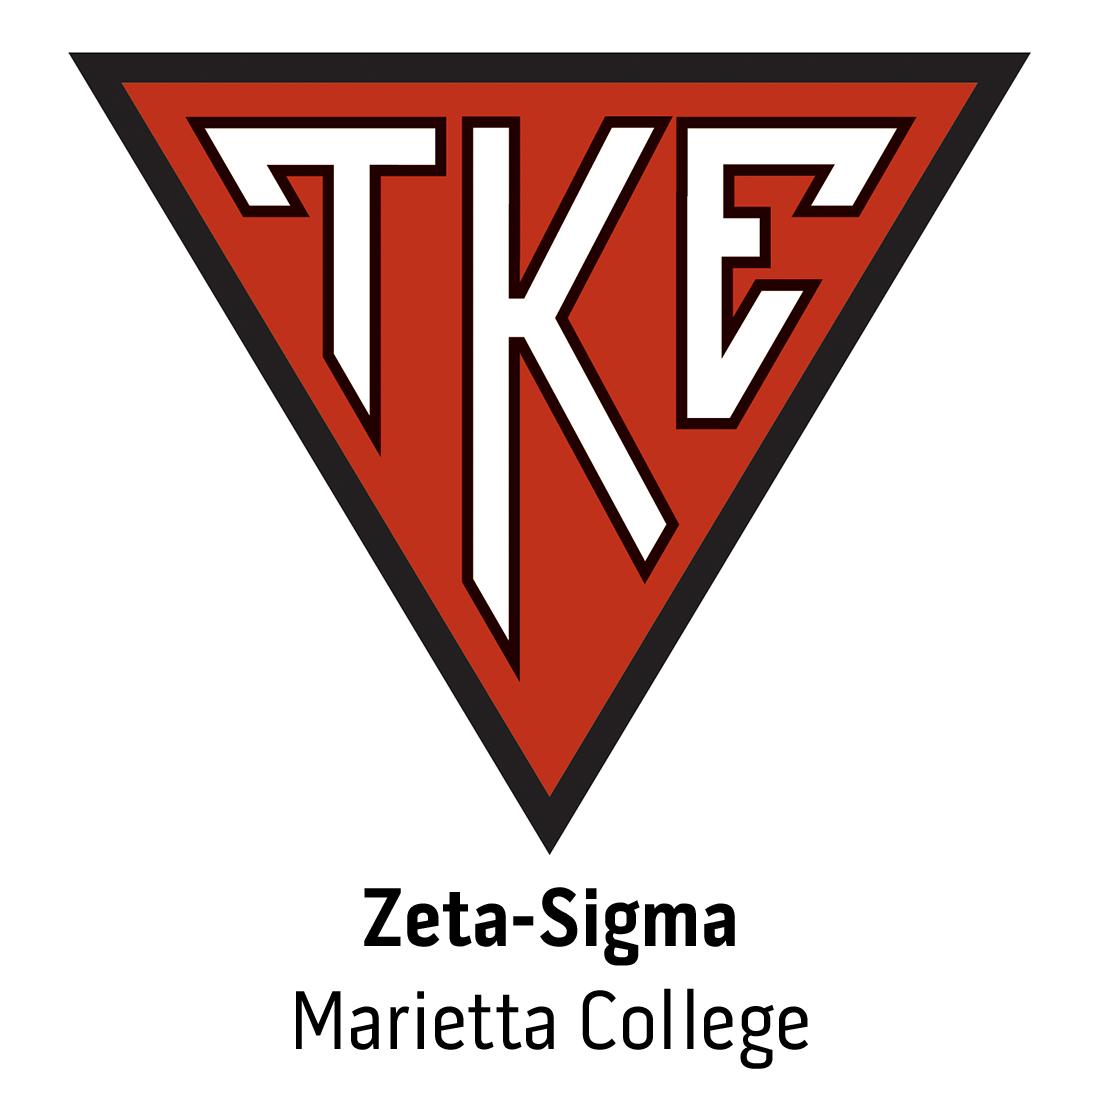 Zeta-Sigma Chapter at Marietta College